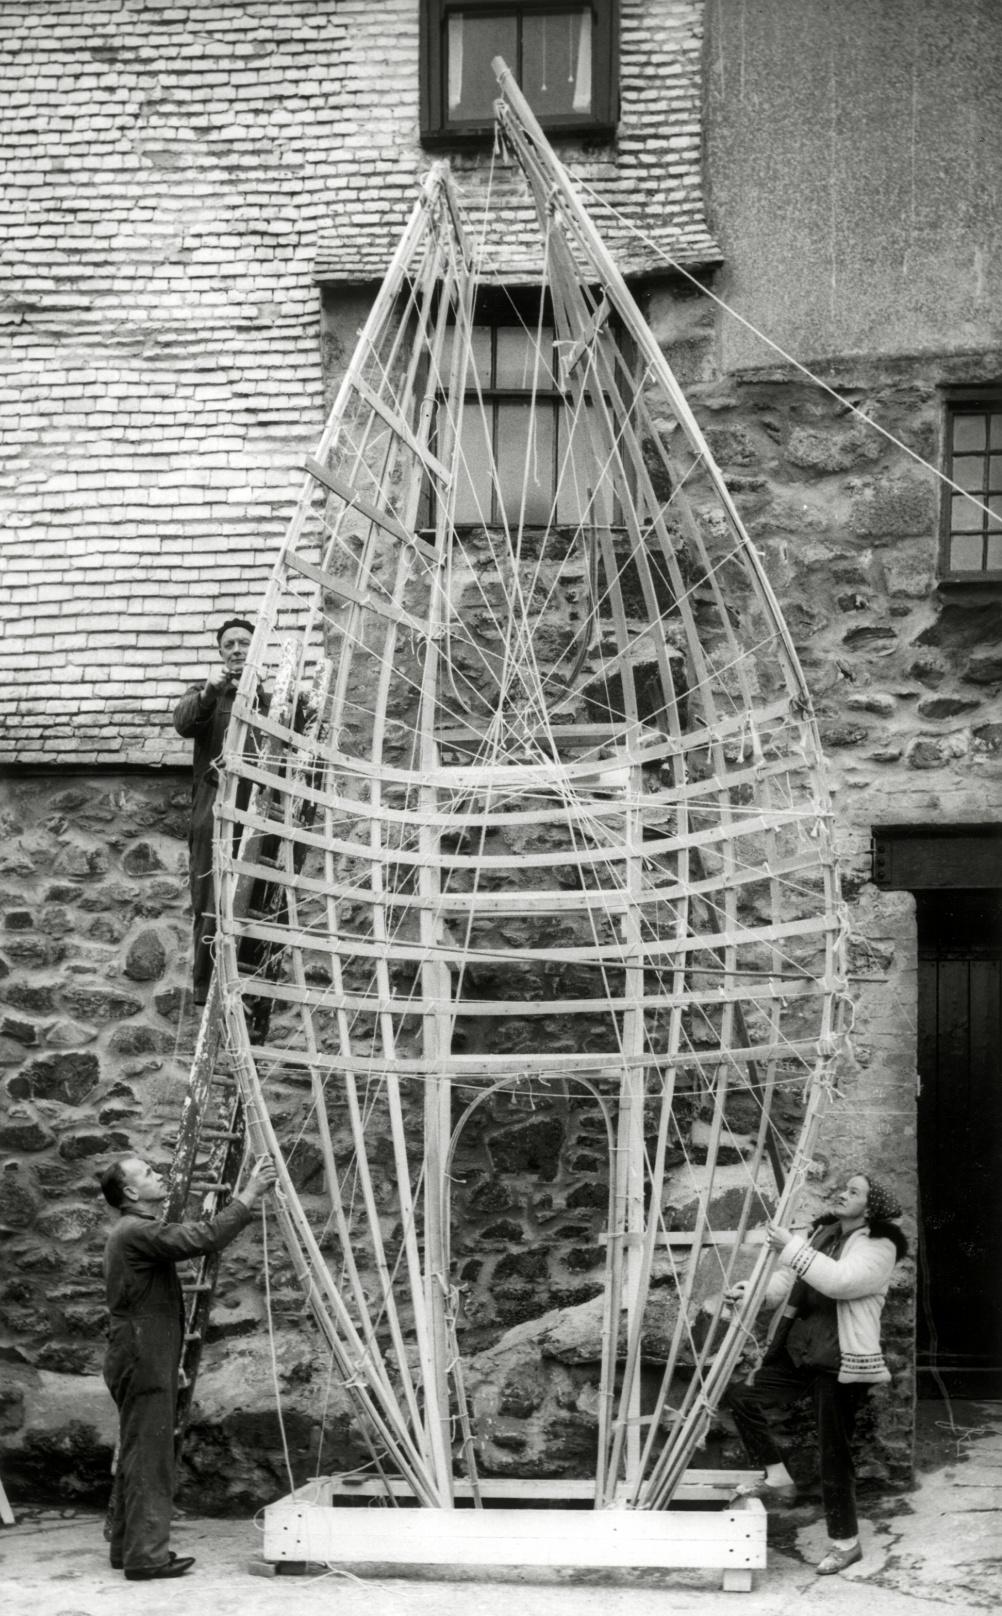 Barbara Hepworth Winged Figure, work in progress, 1962, Courtesy Bowness, Hepworth Estate